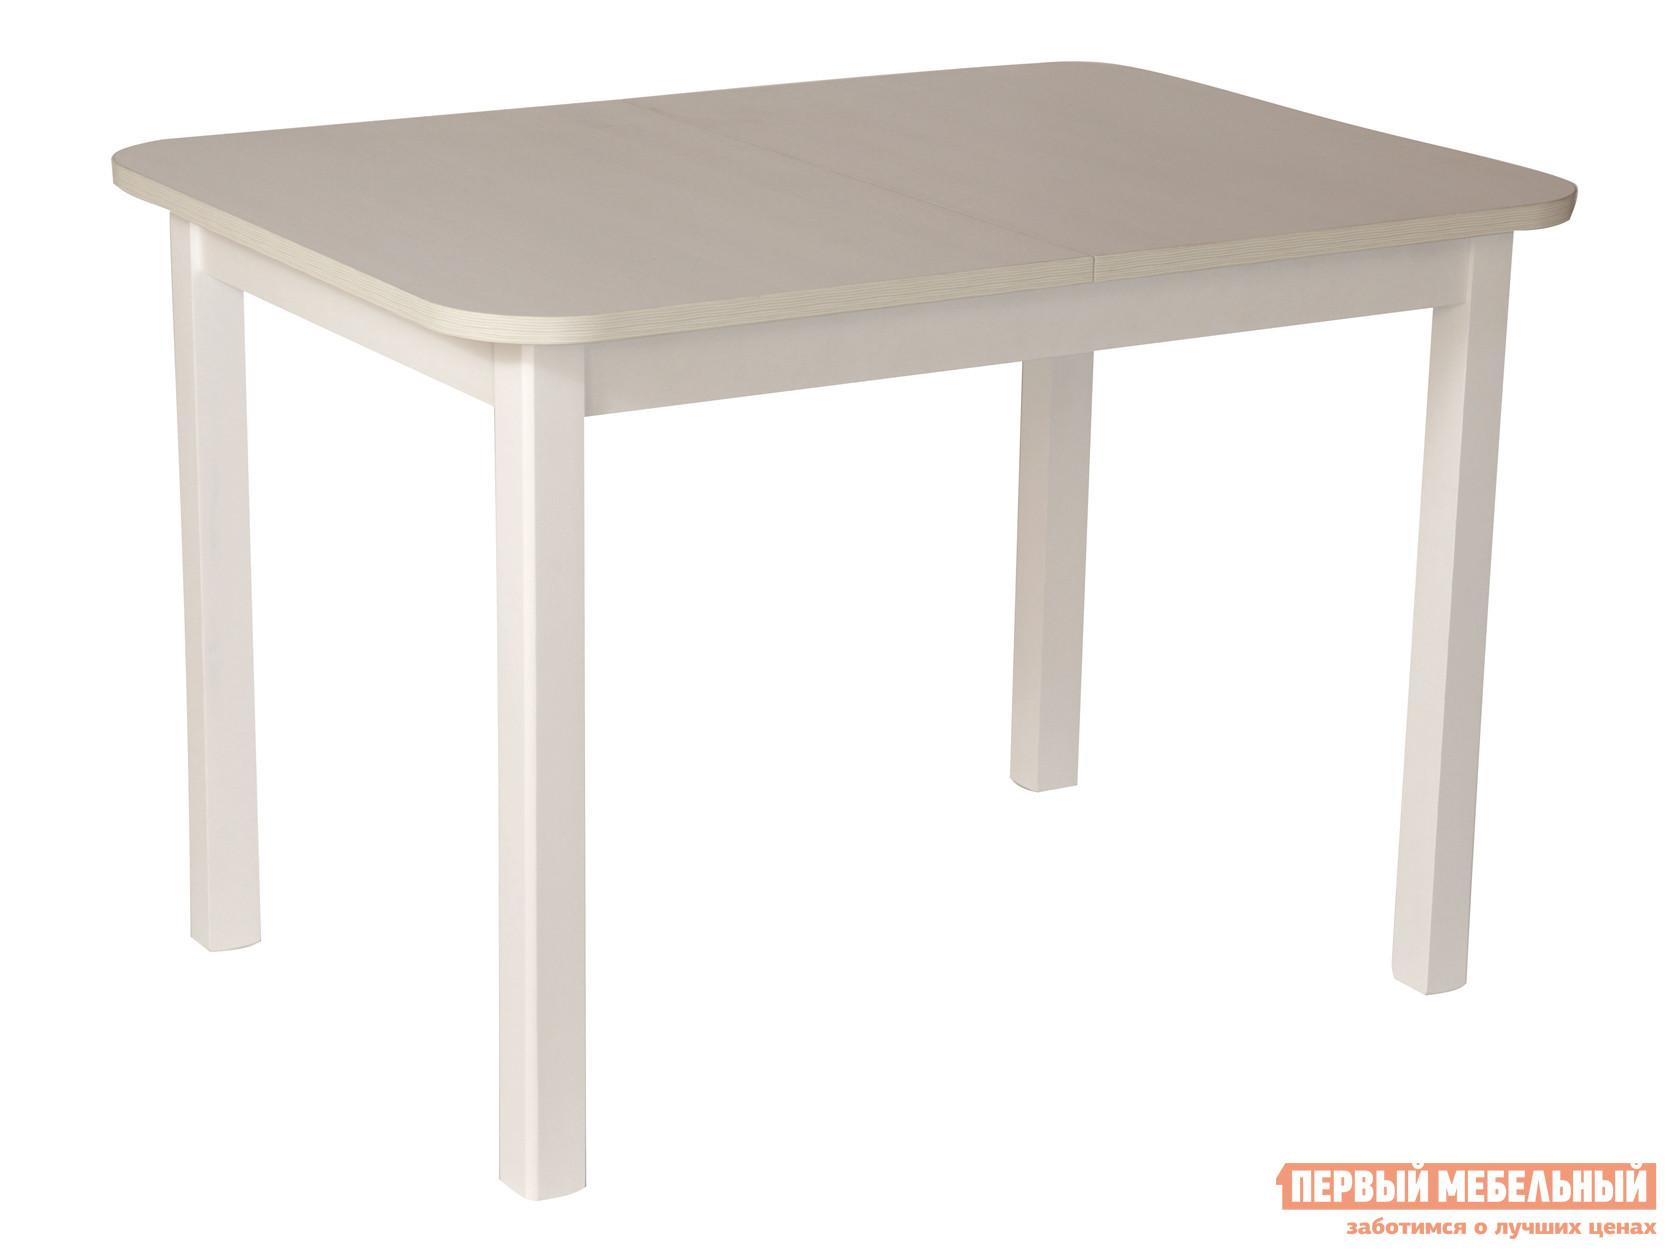 Кухонный стол  Франц Белая эмаль / Бодега белый Мебвилл 126806